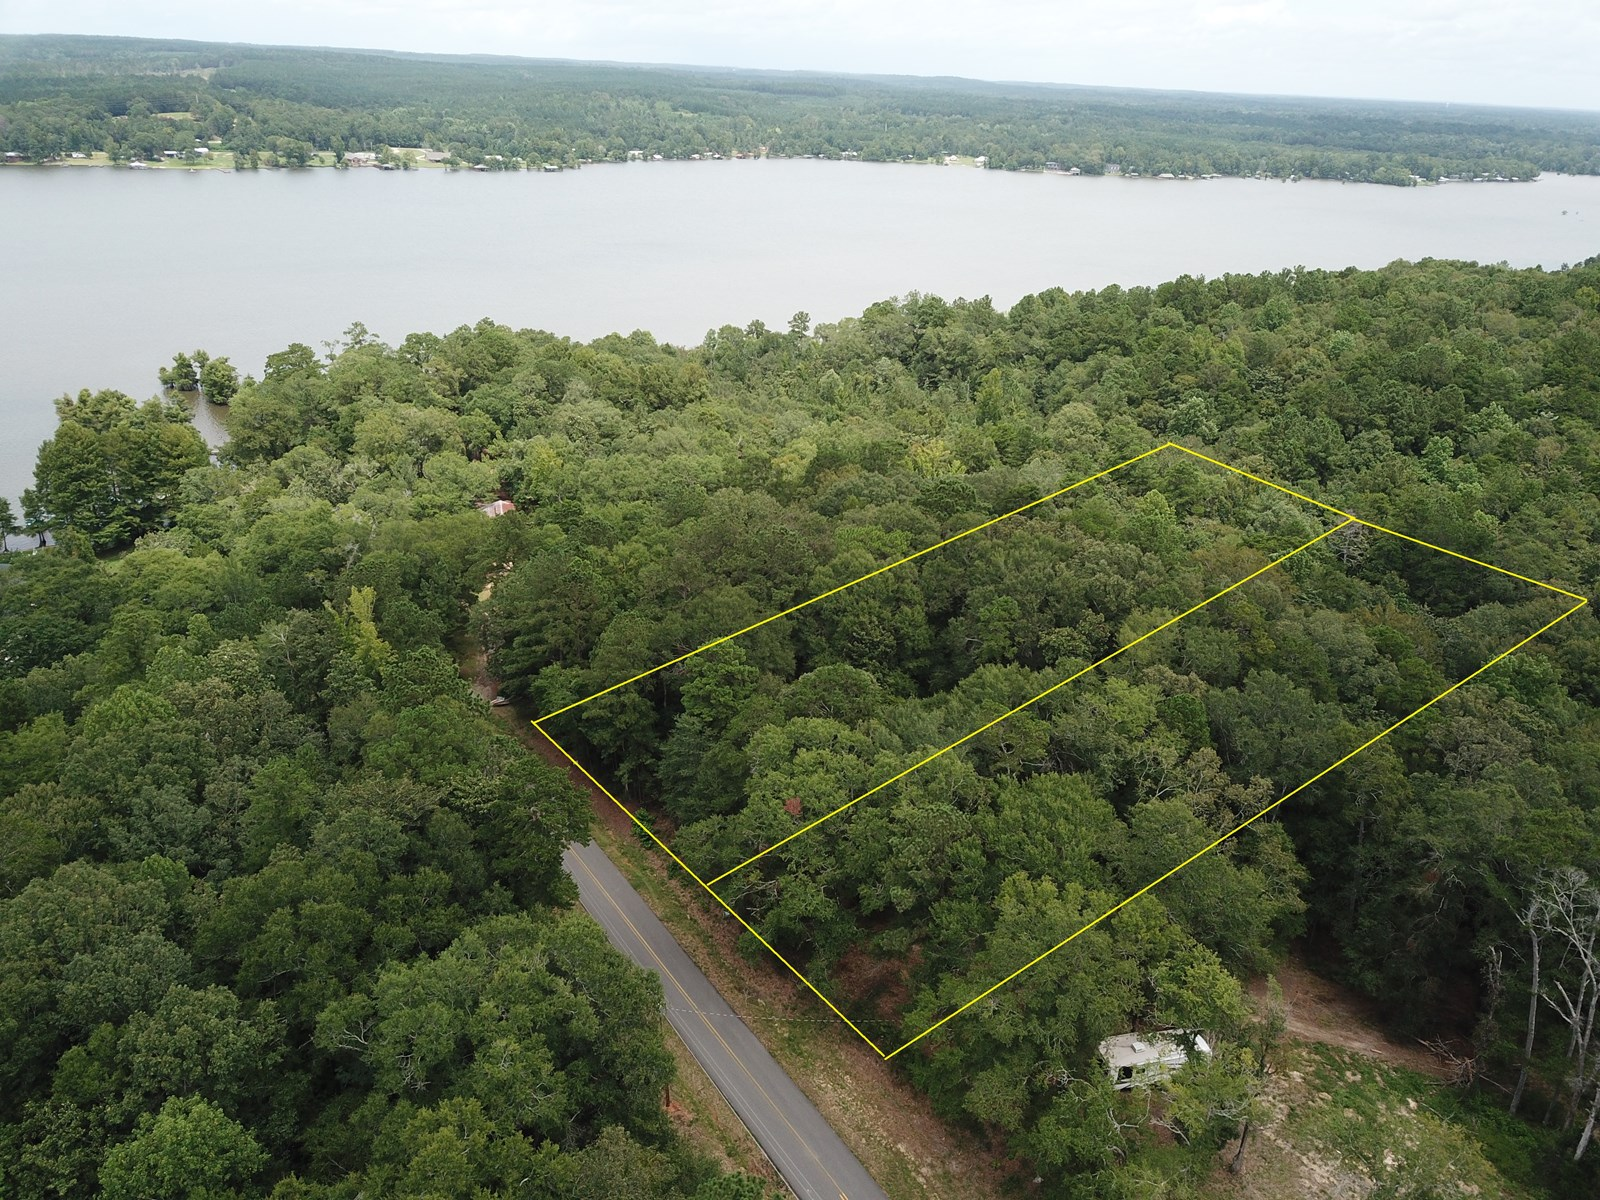 1 acre Lot of Land - Gantt Lake - Covington County Alabama